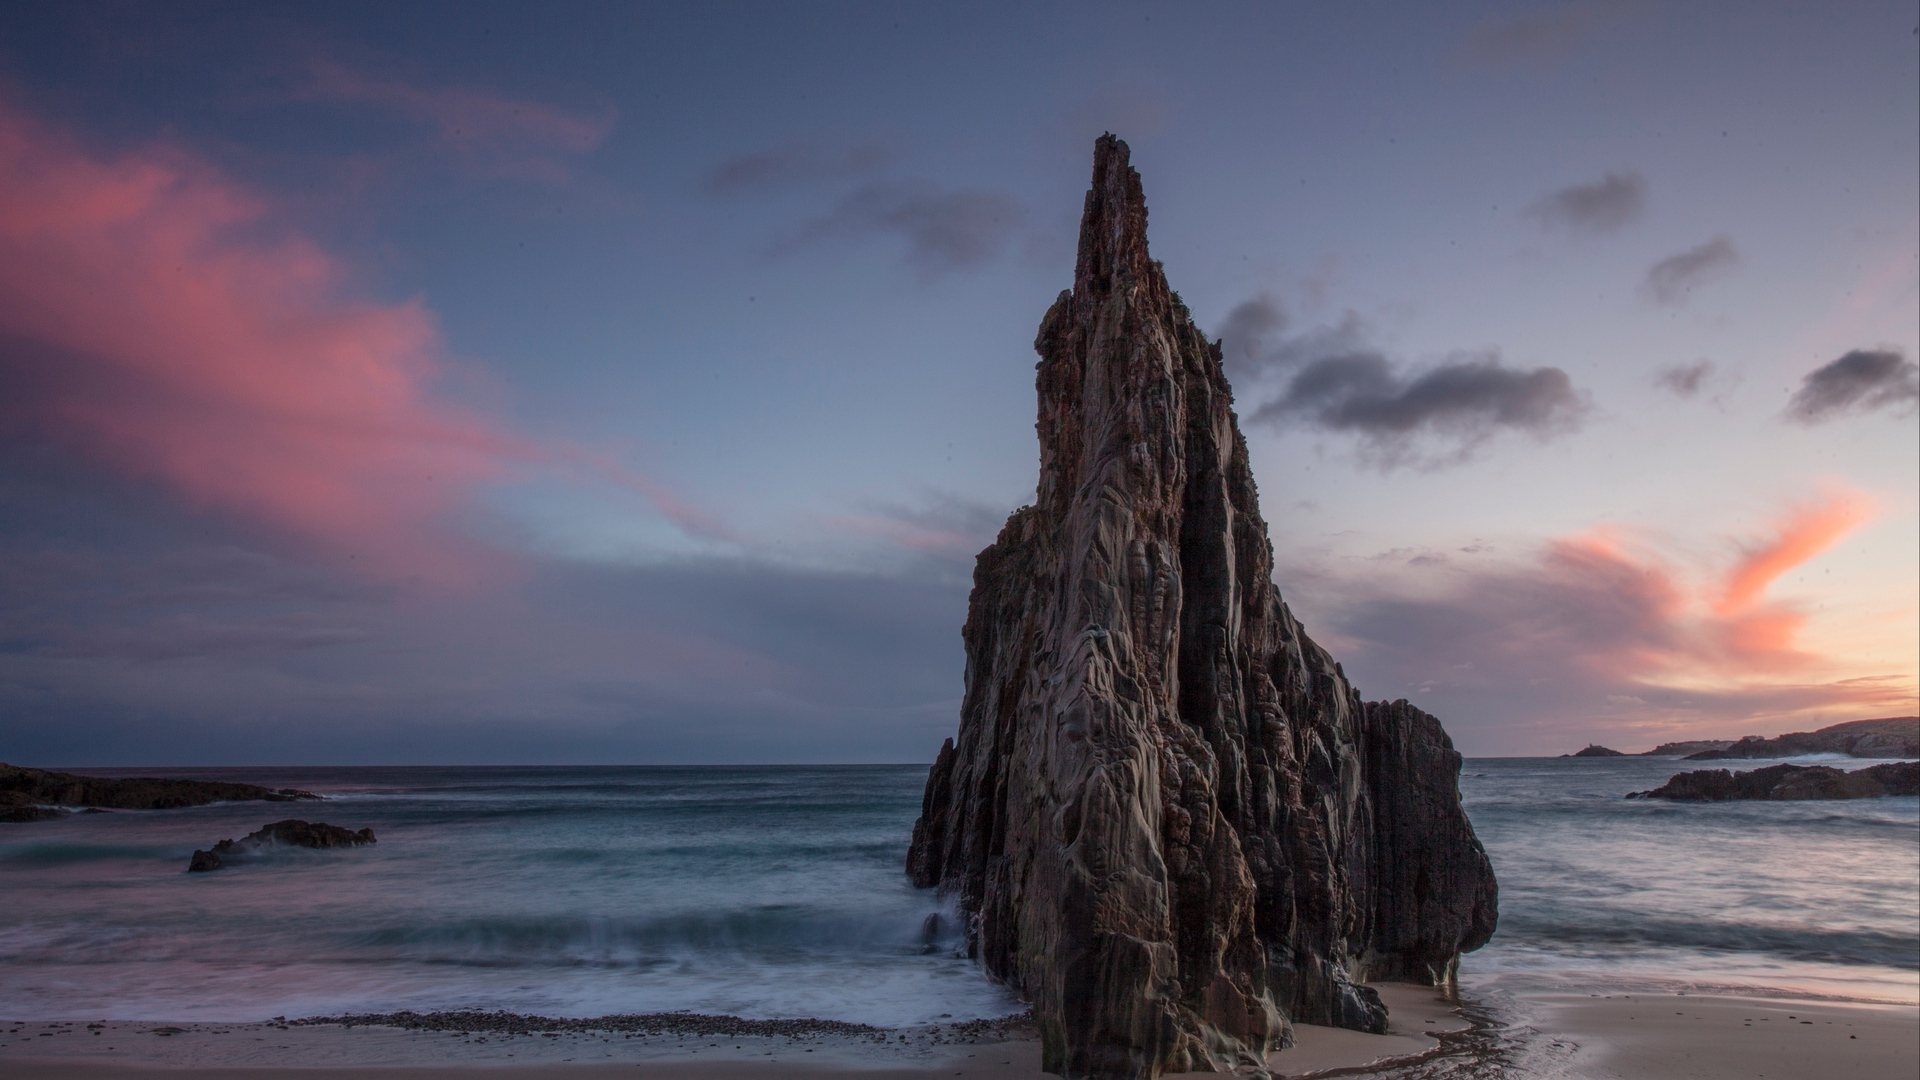 Cliff Shore Sea Waves Sky Clouds Beach 1920x1080